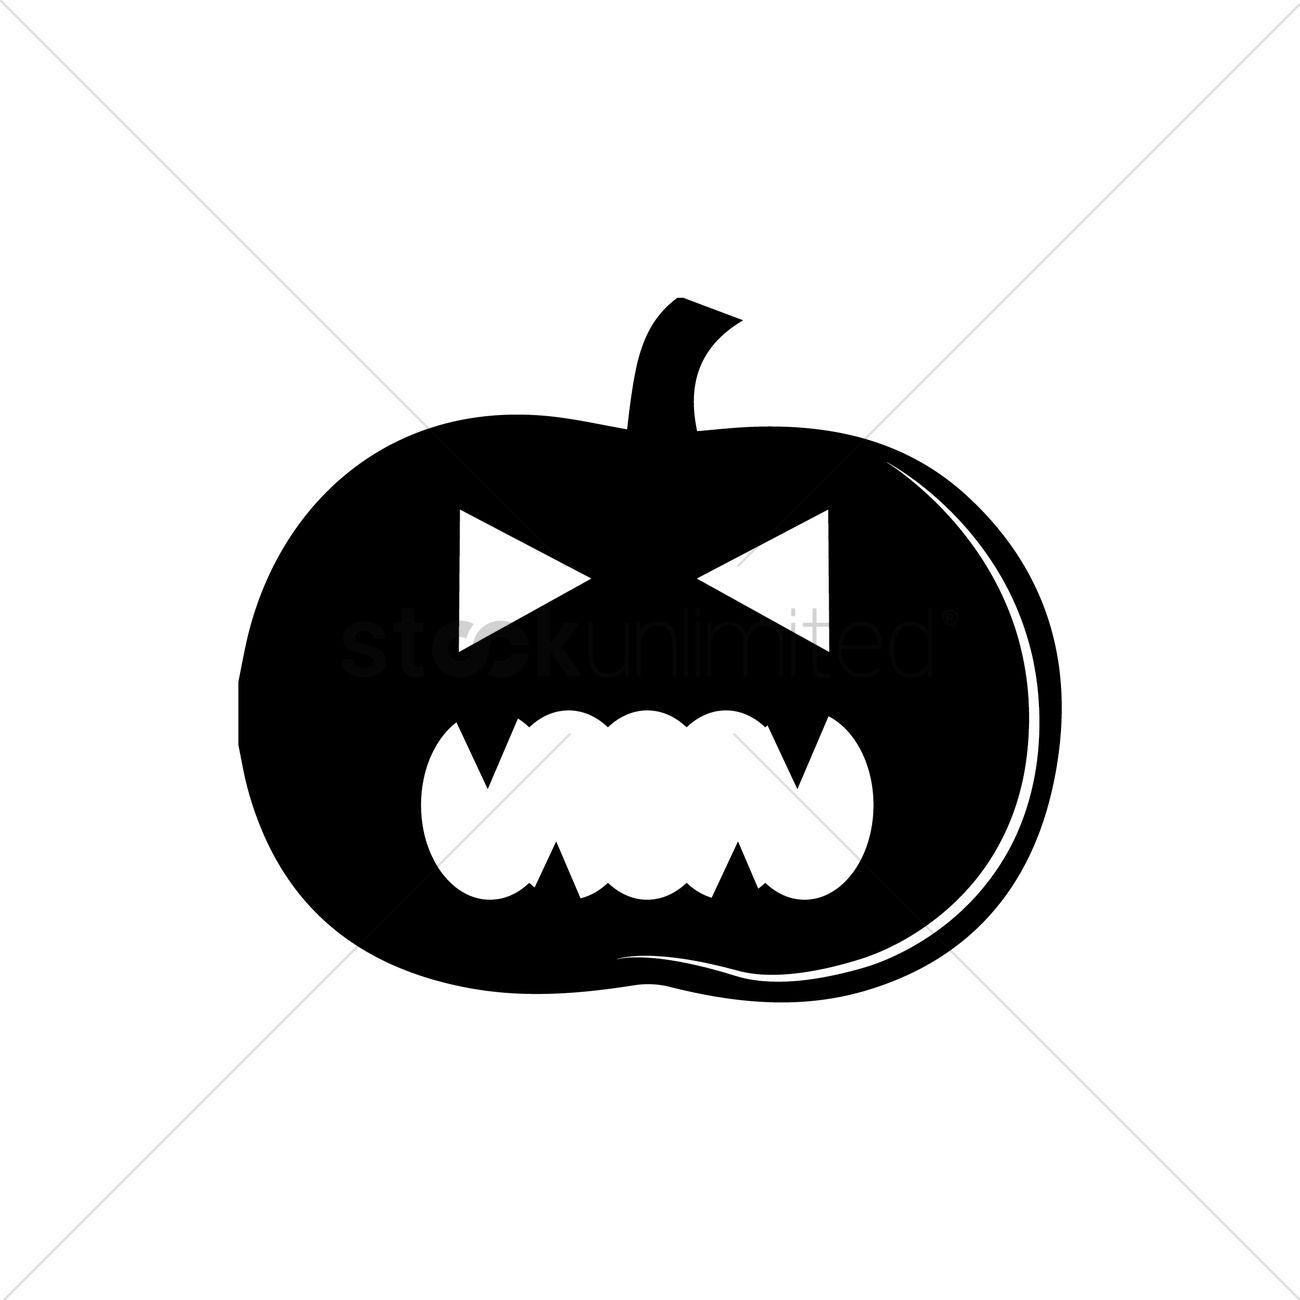 Halloween silhouette pumpkin for Pumpkin carving silhouettes